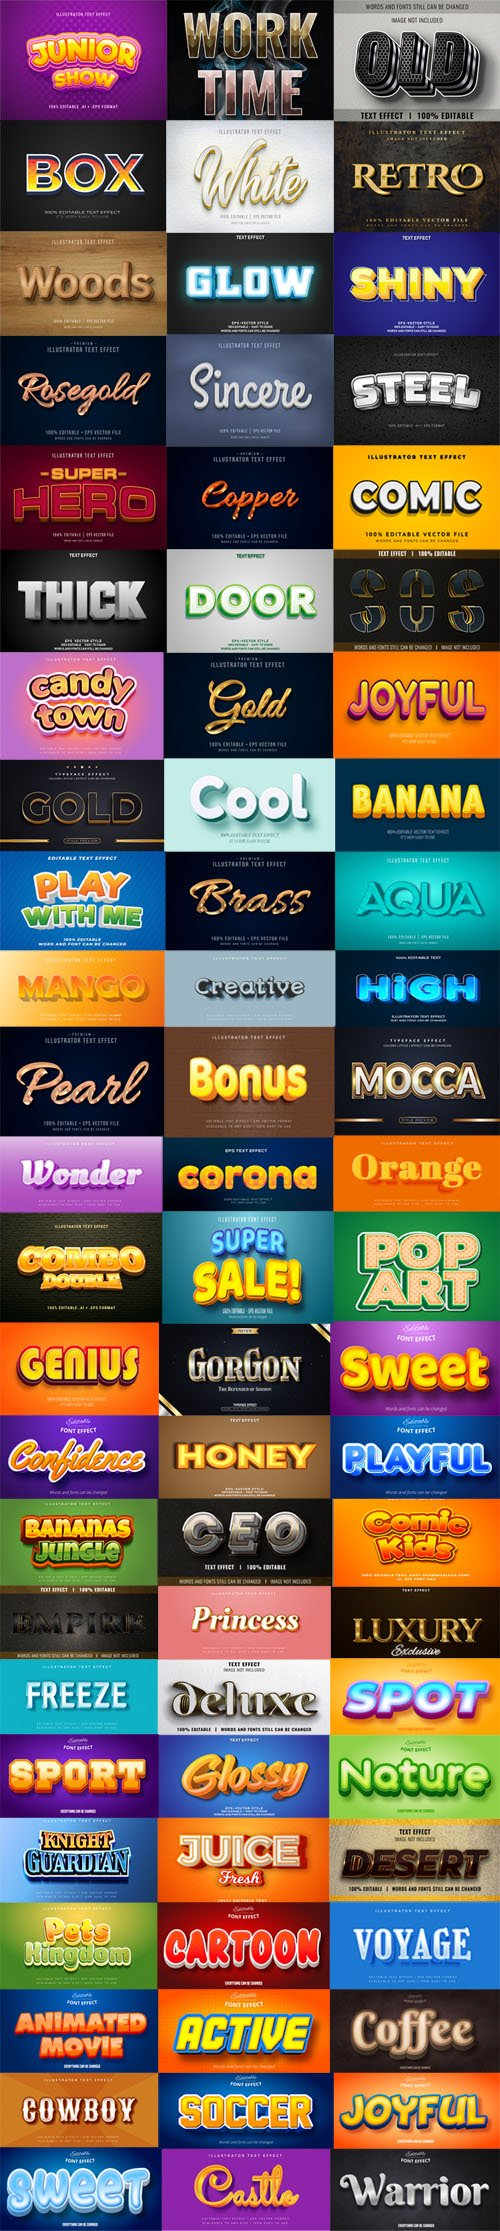 Editable Illustration Font Effects Bundle [Pack-2] - 74 Font Effects